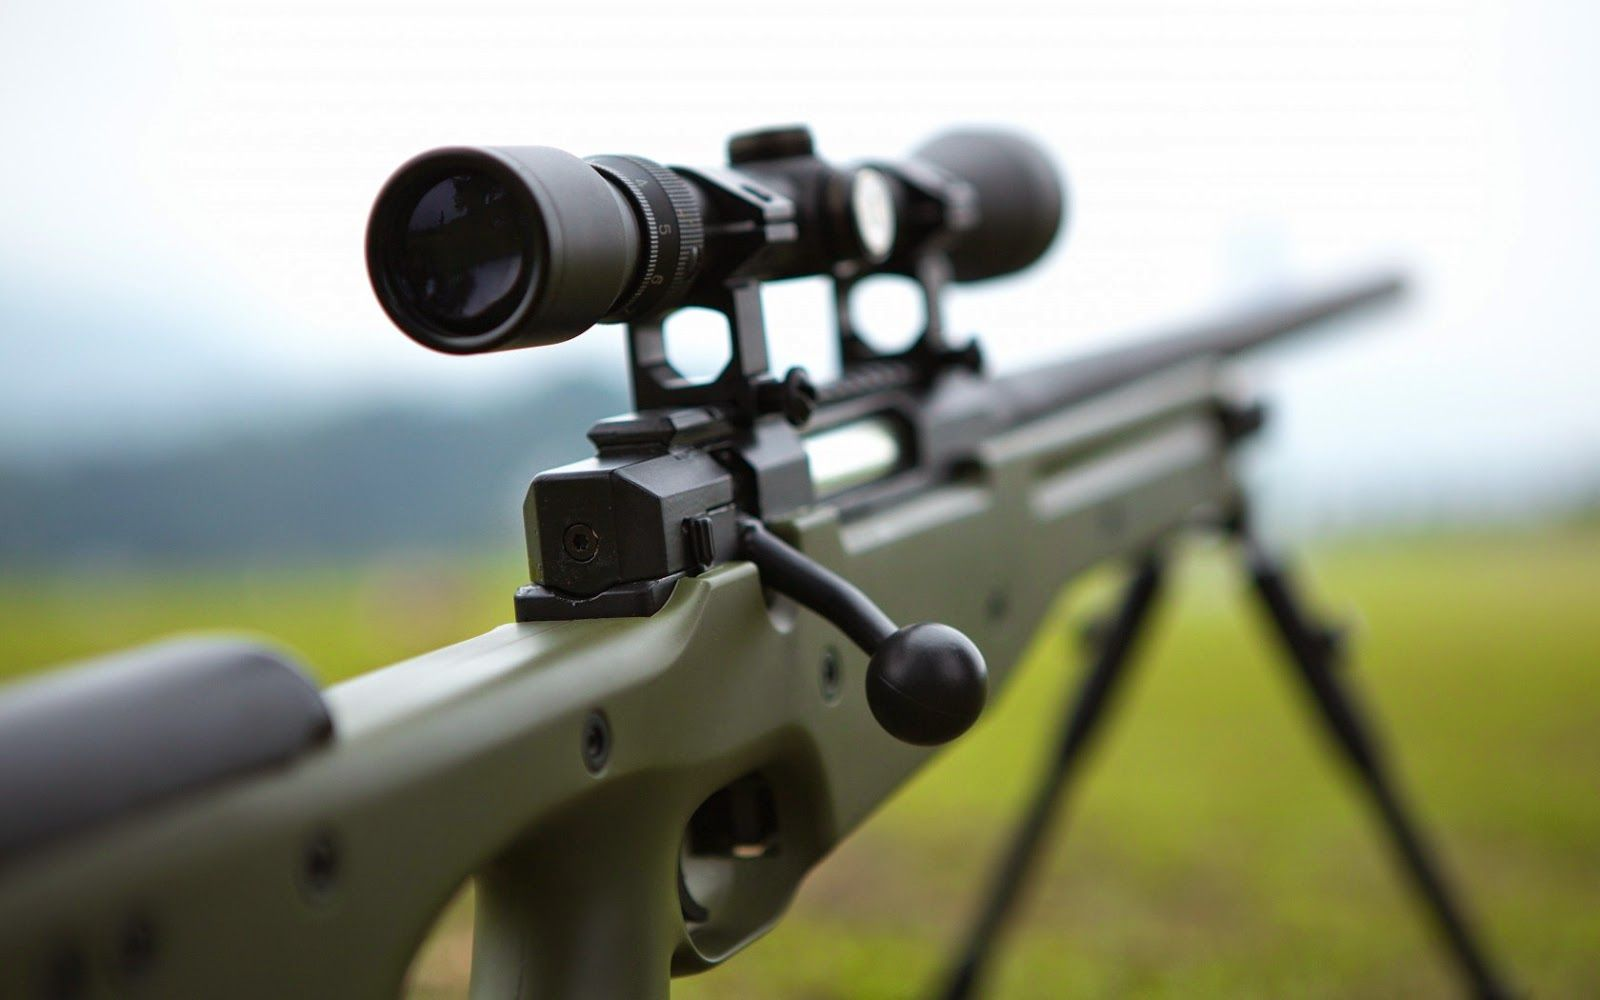 AWP HD Sniper Rifle Wallpaper